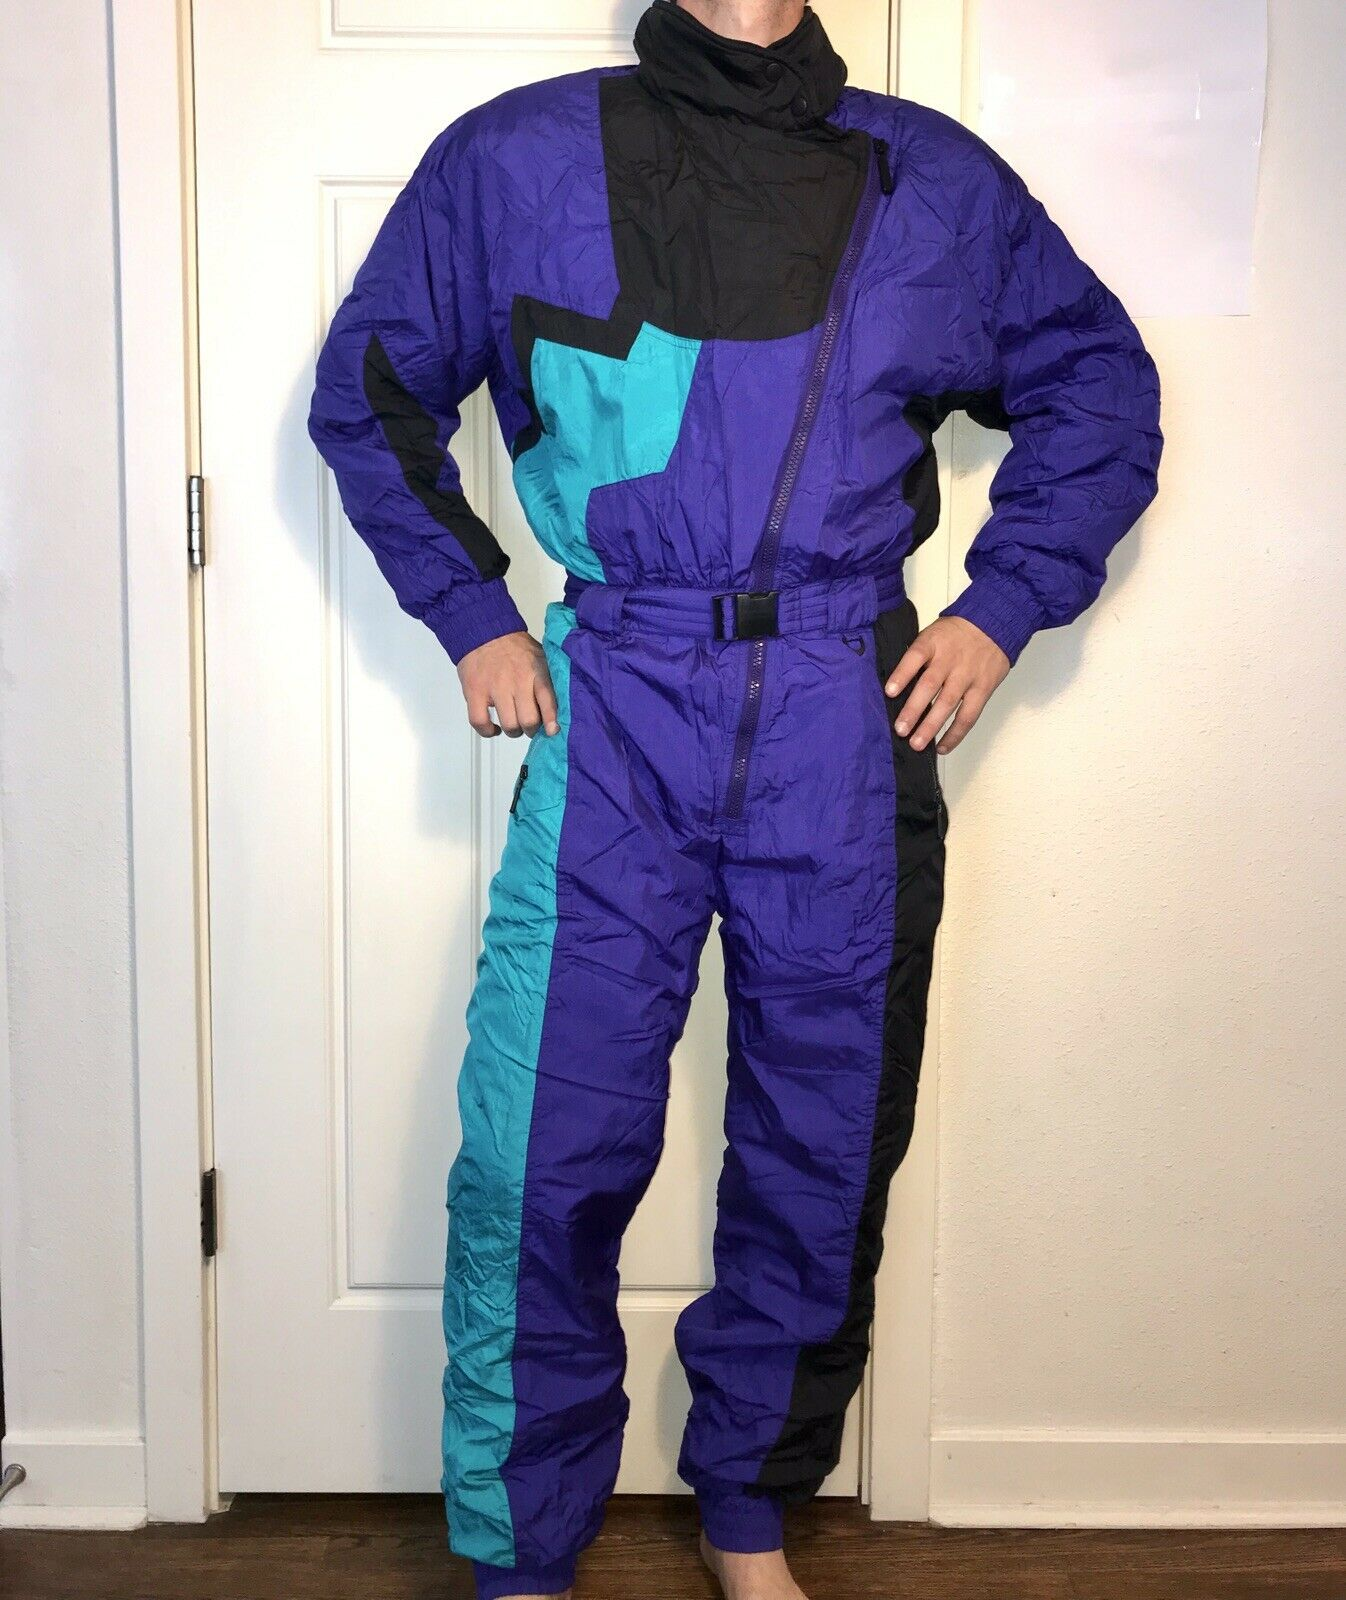 Vtg 80s 90s Womens  Medium PROFILE One piece SKI SUIT Snow Bib Snowsuit Gaper Day  wholesape cheap